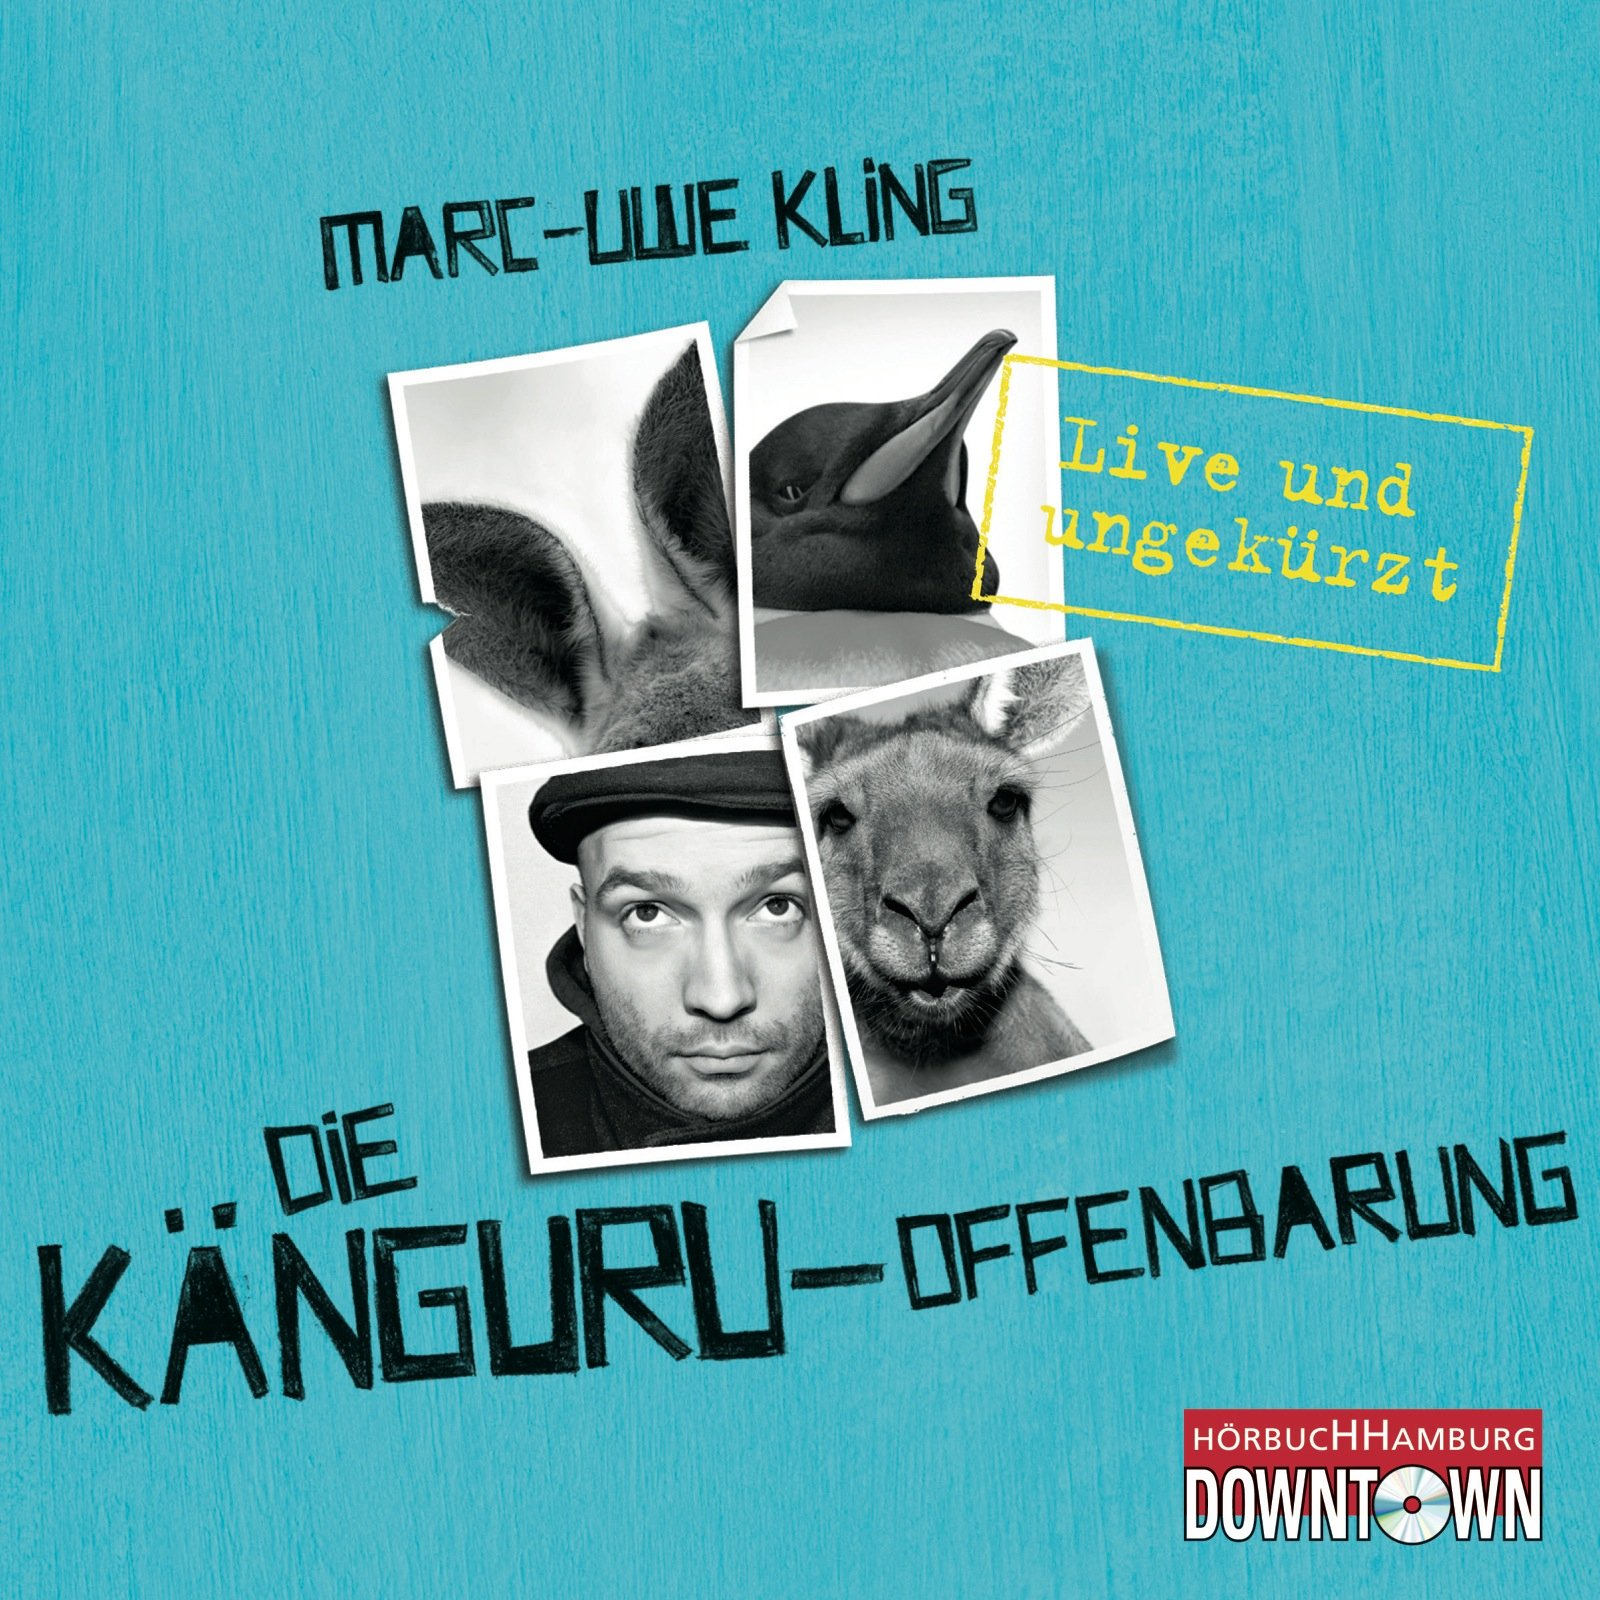 Hörbuch Hamburg Die Känguru-Offenbarung